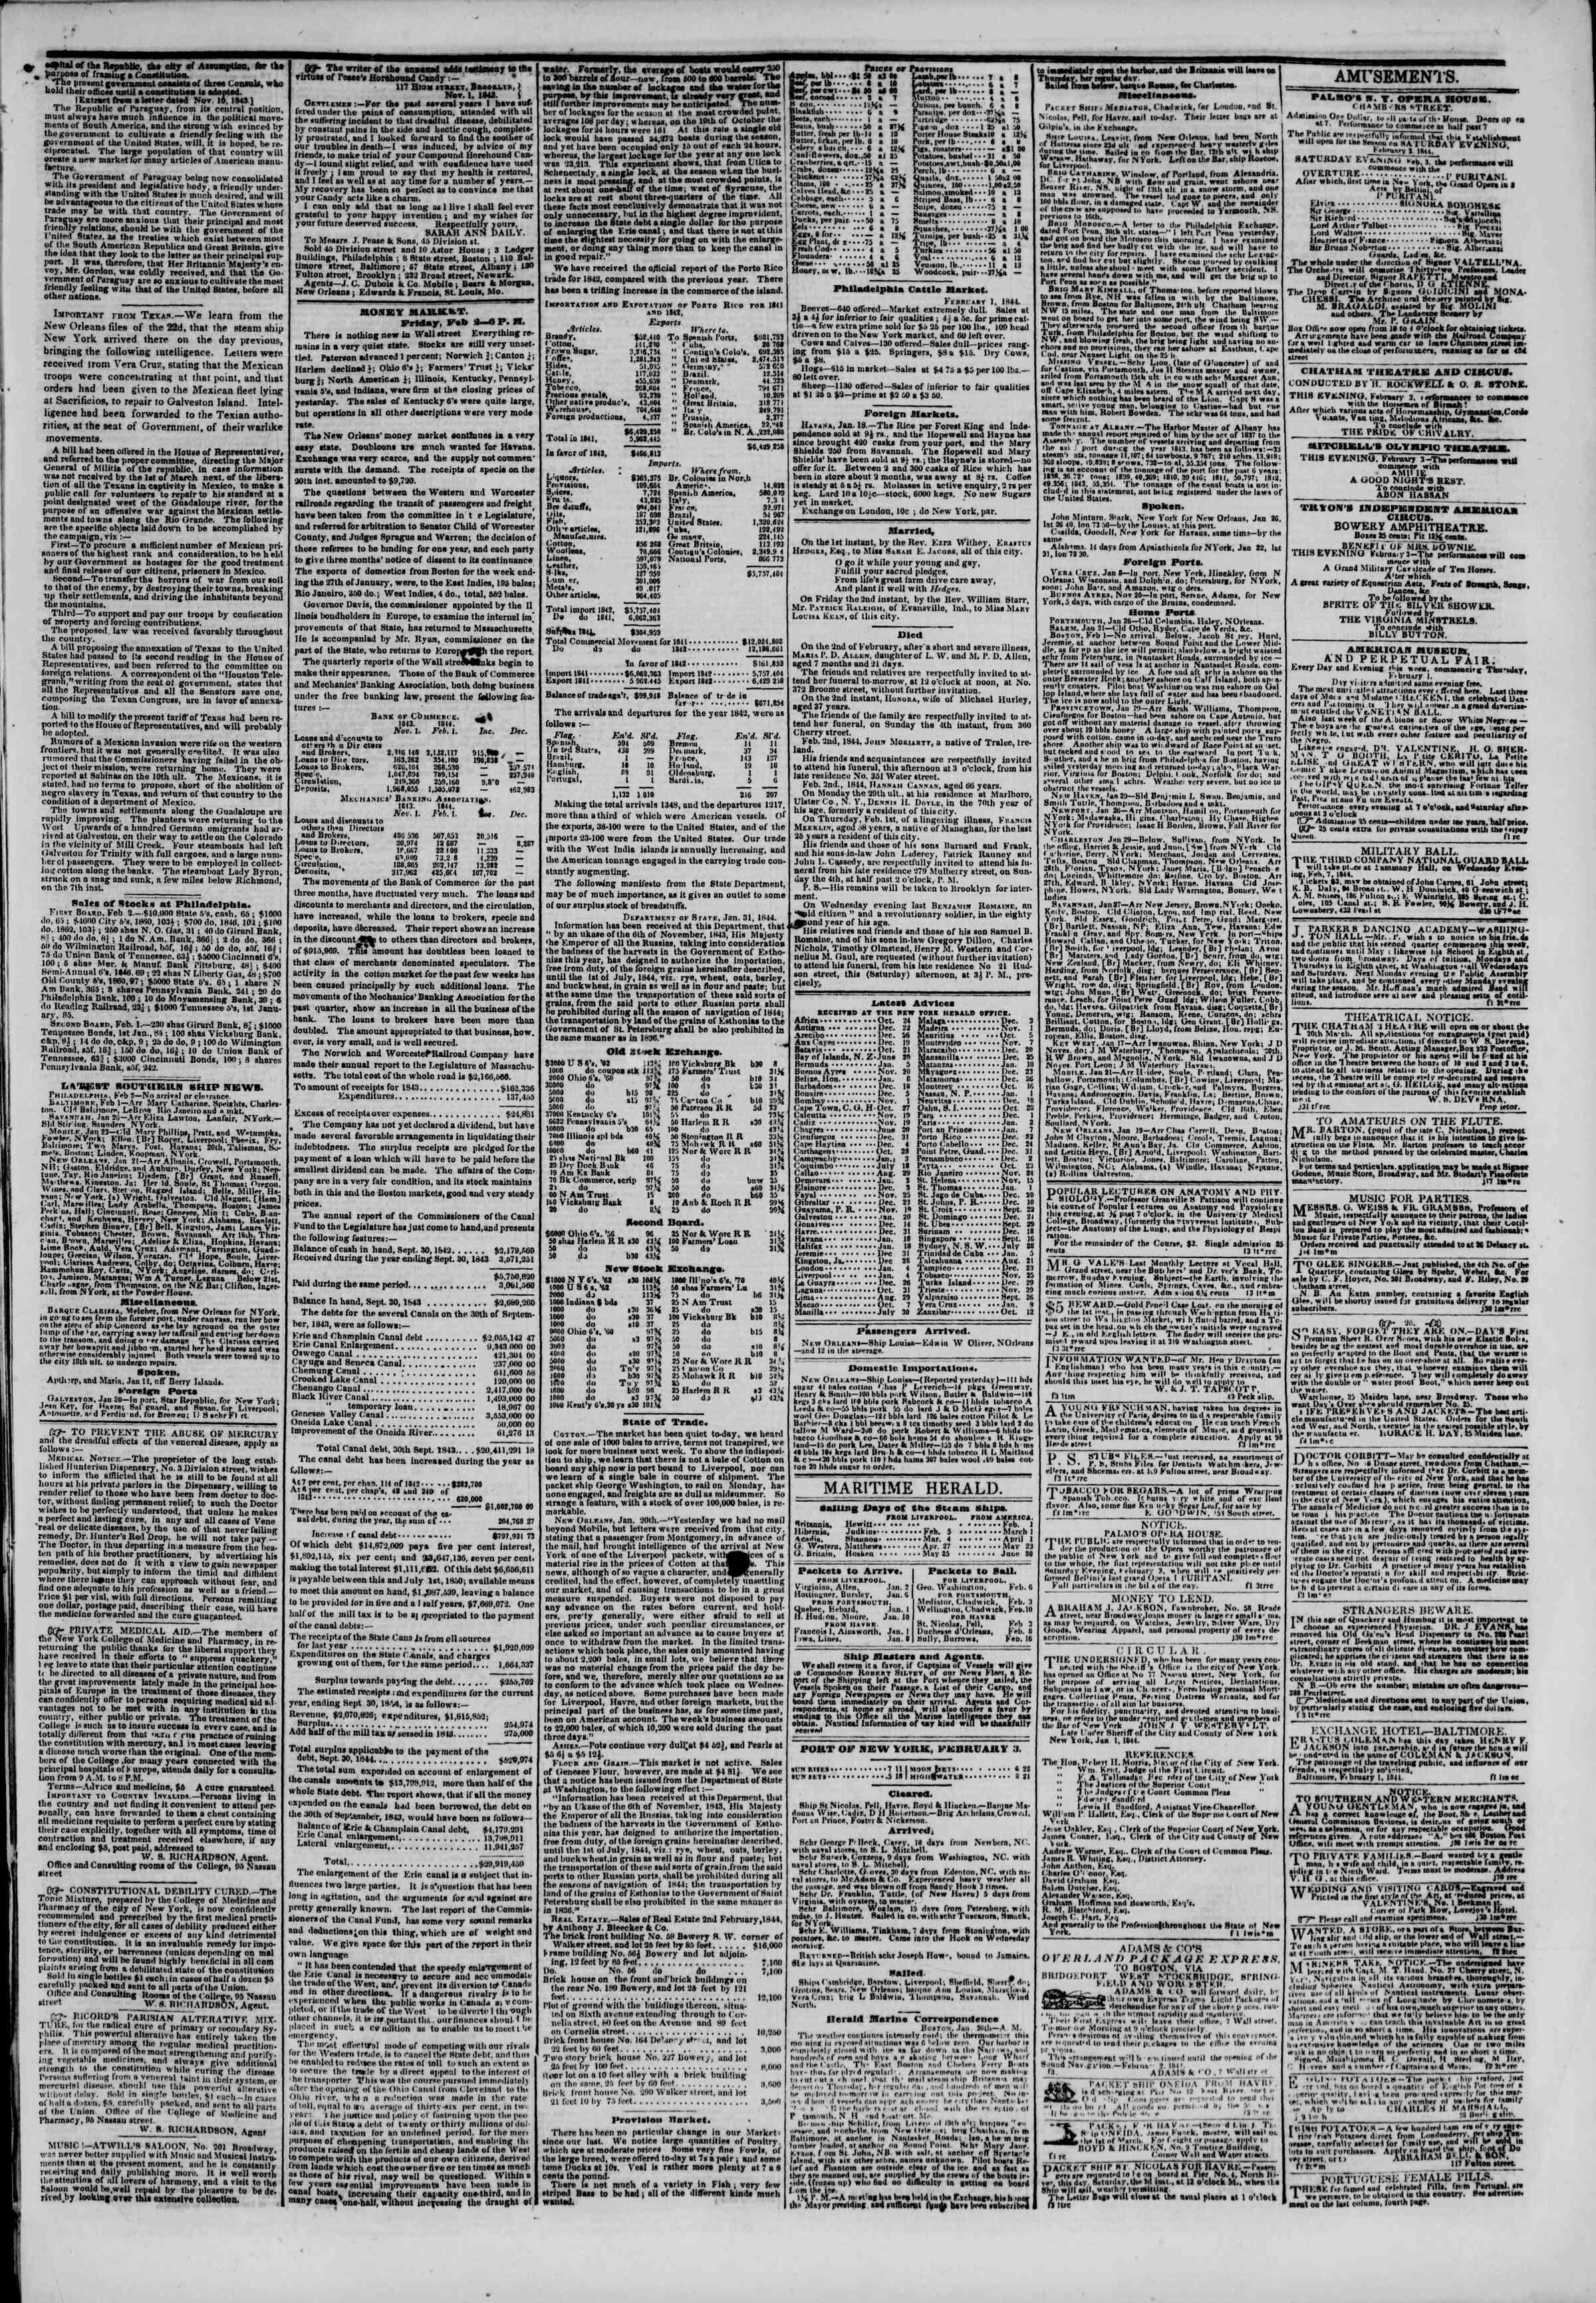 February 3, 1844 Tarihli The New York Herald Gazetesi Sayfa 3